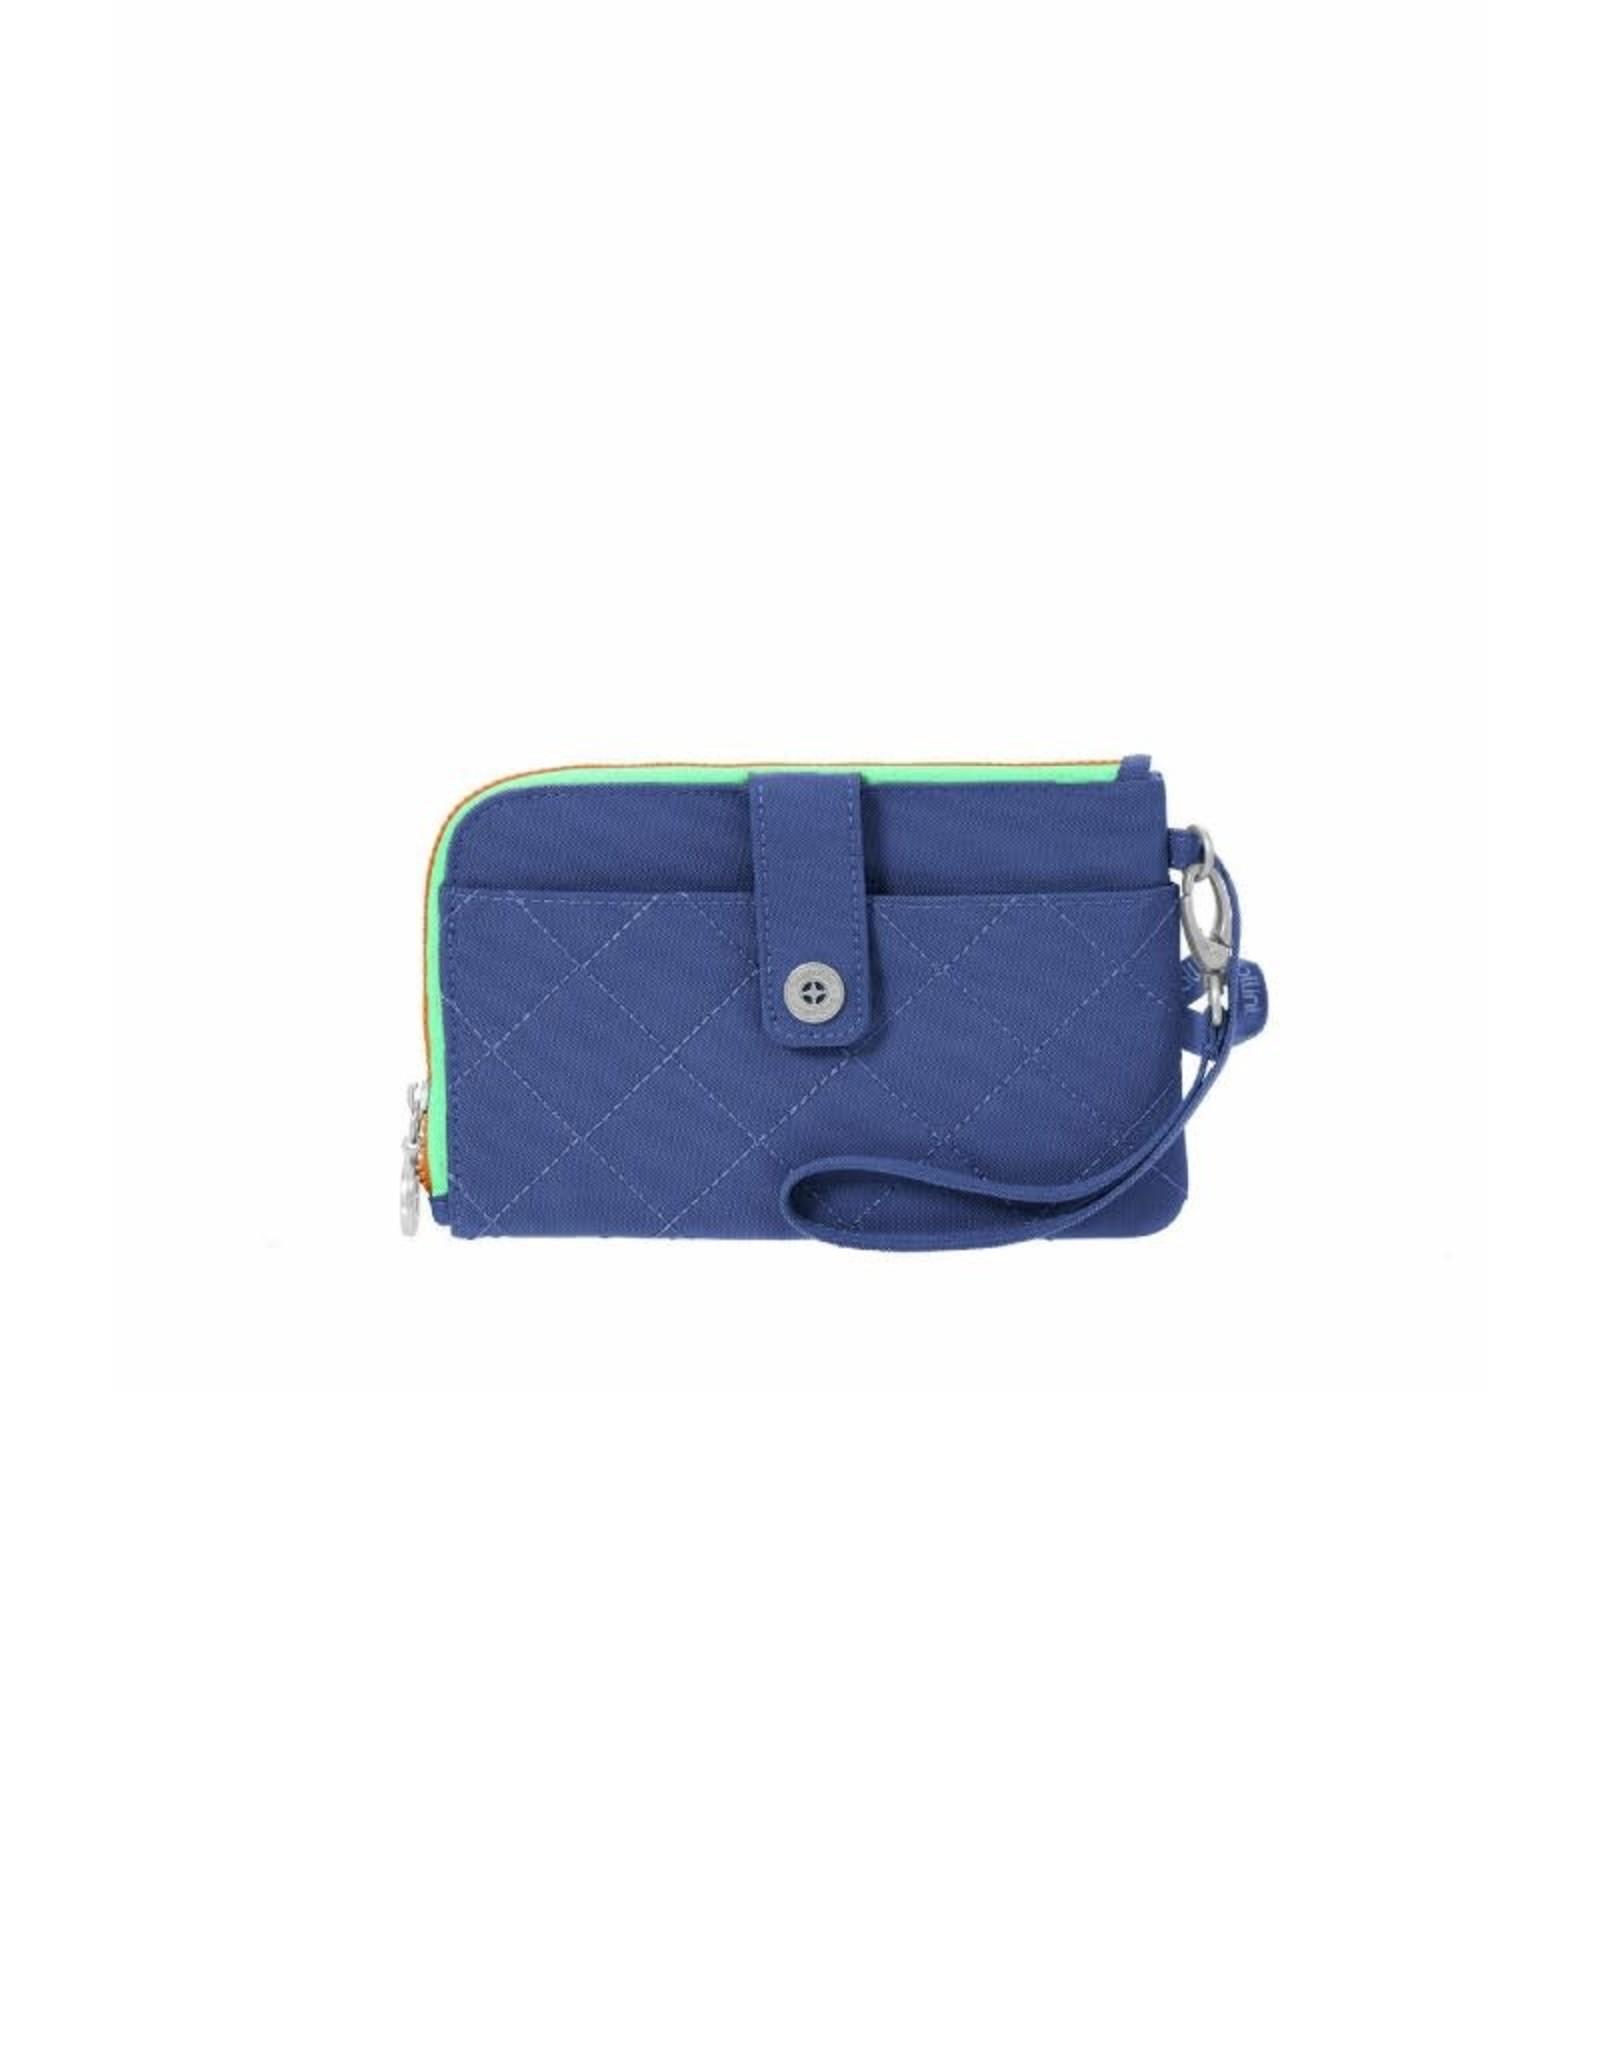 Baggallini RFID Passport & Phone Wristlet